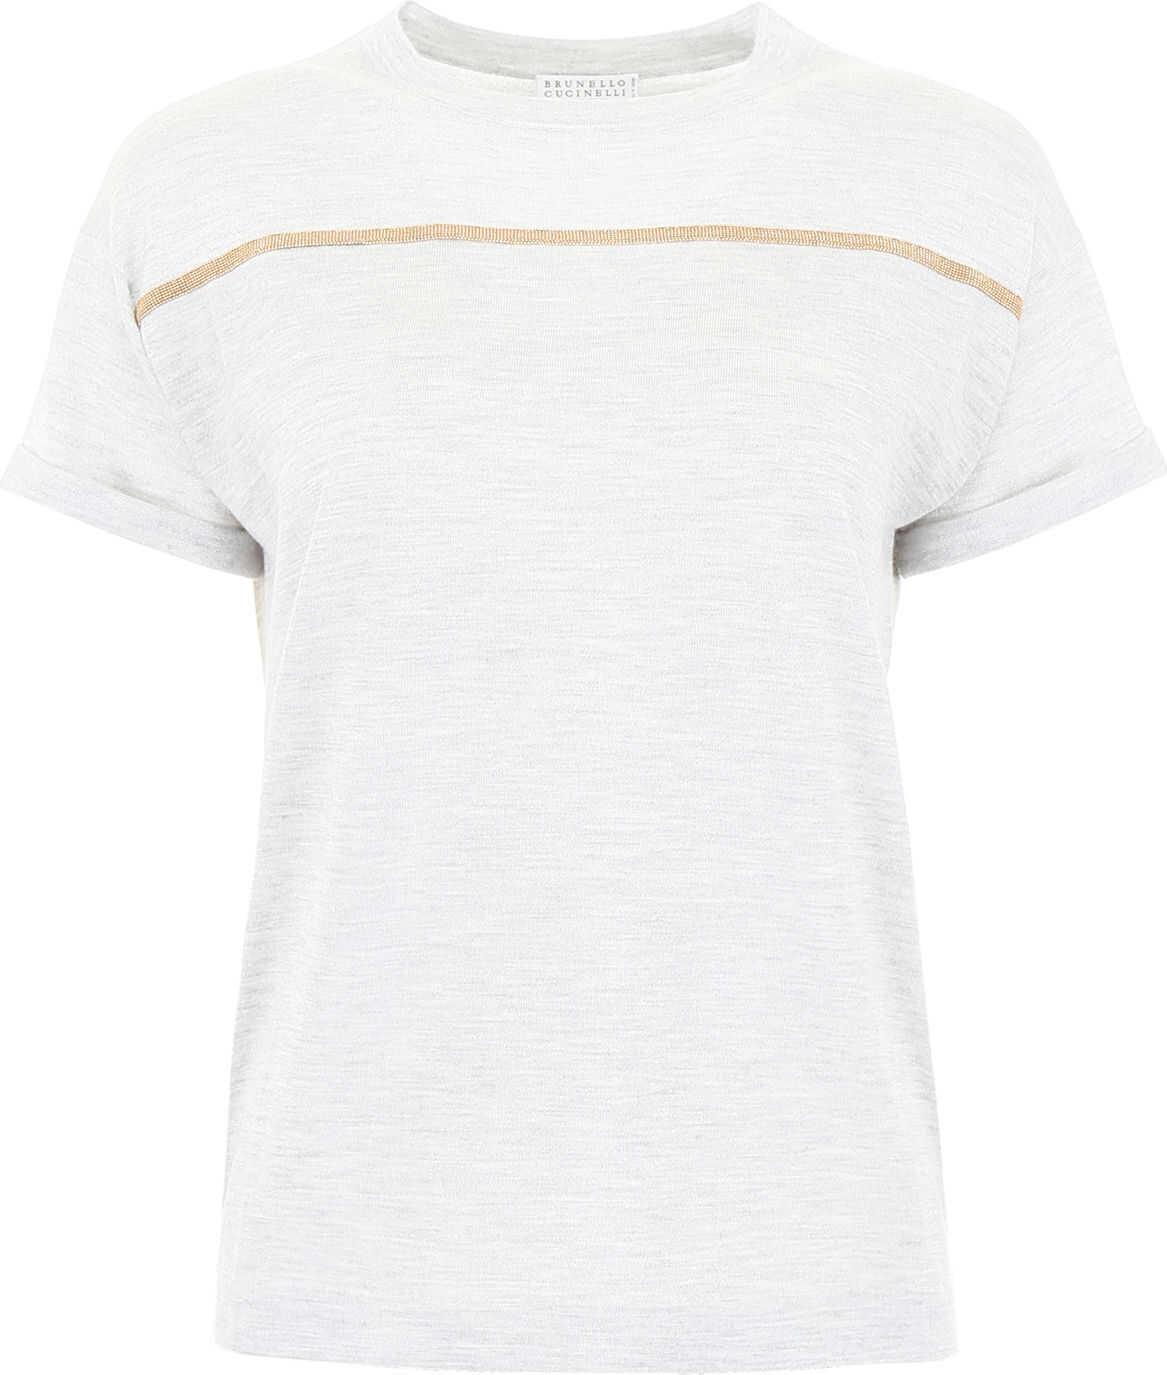 Brunello Cucinelli Embellished T-Shirt LIGHT GREY